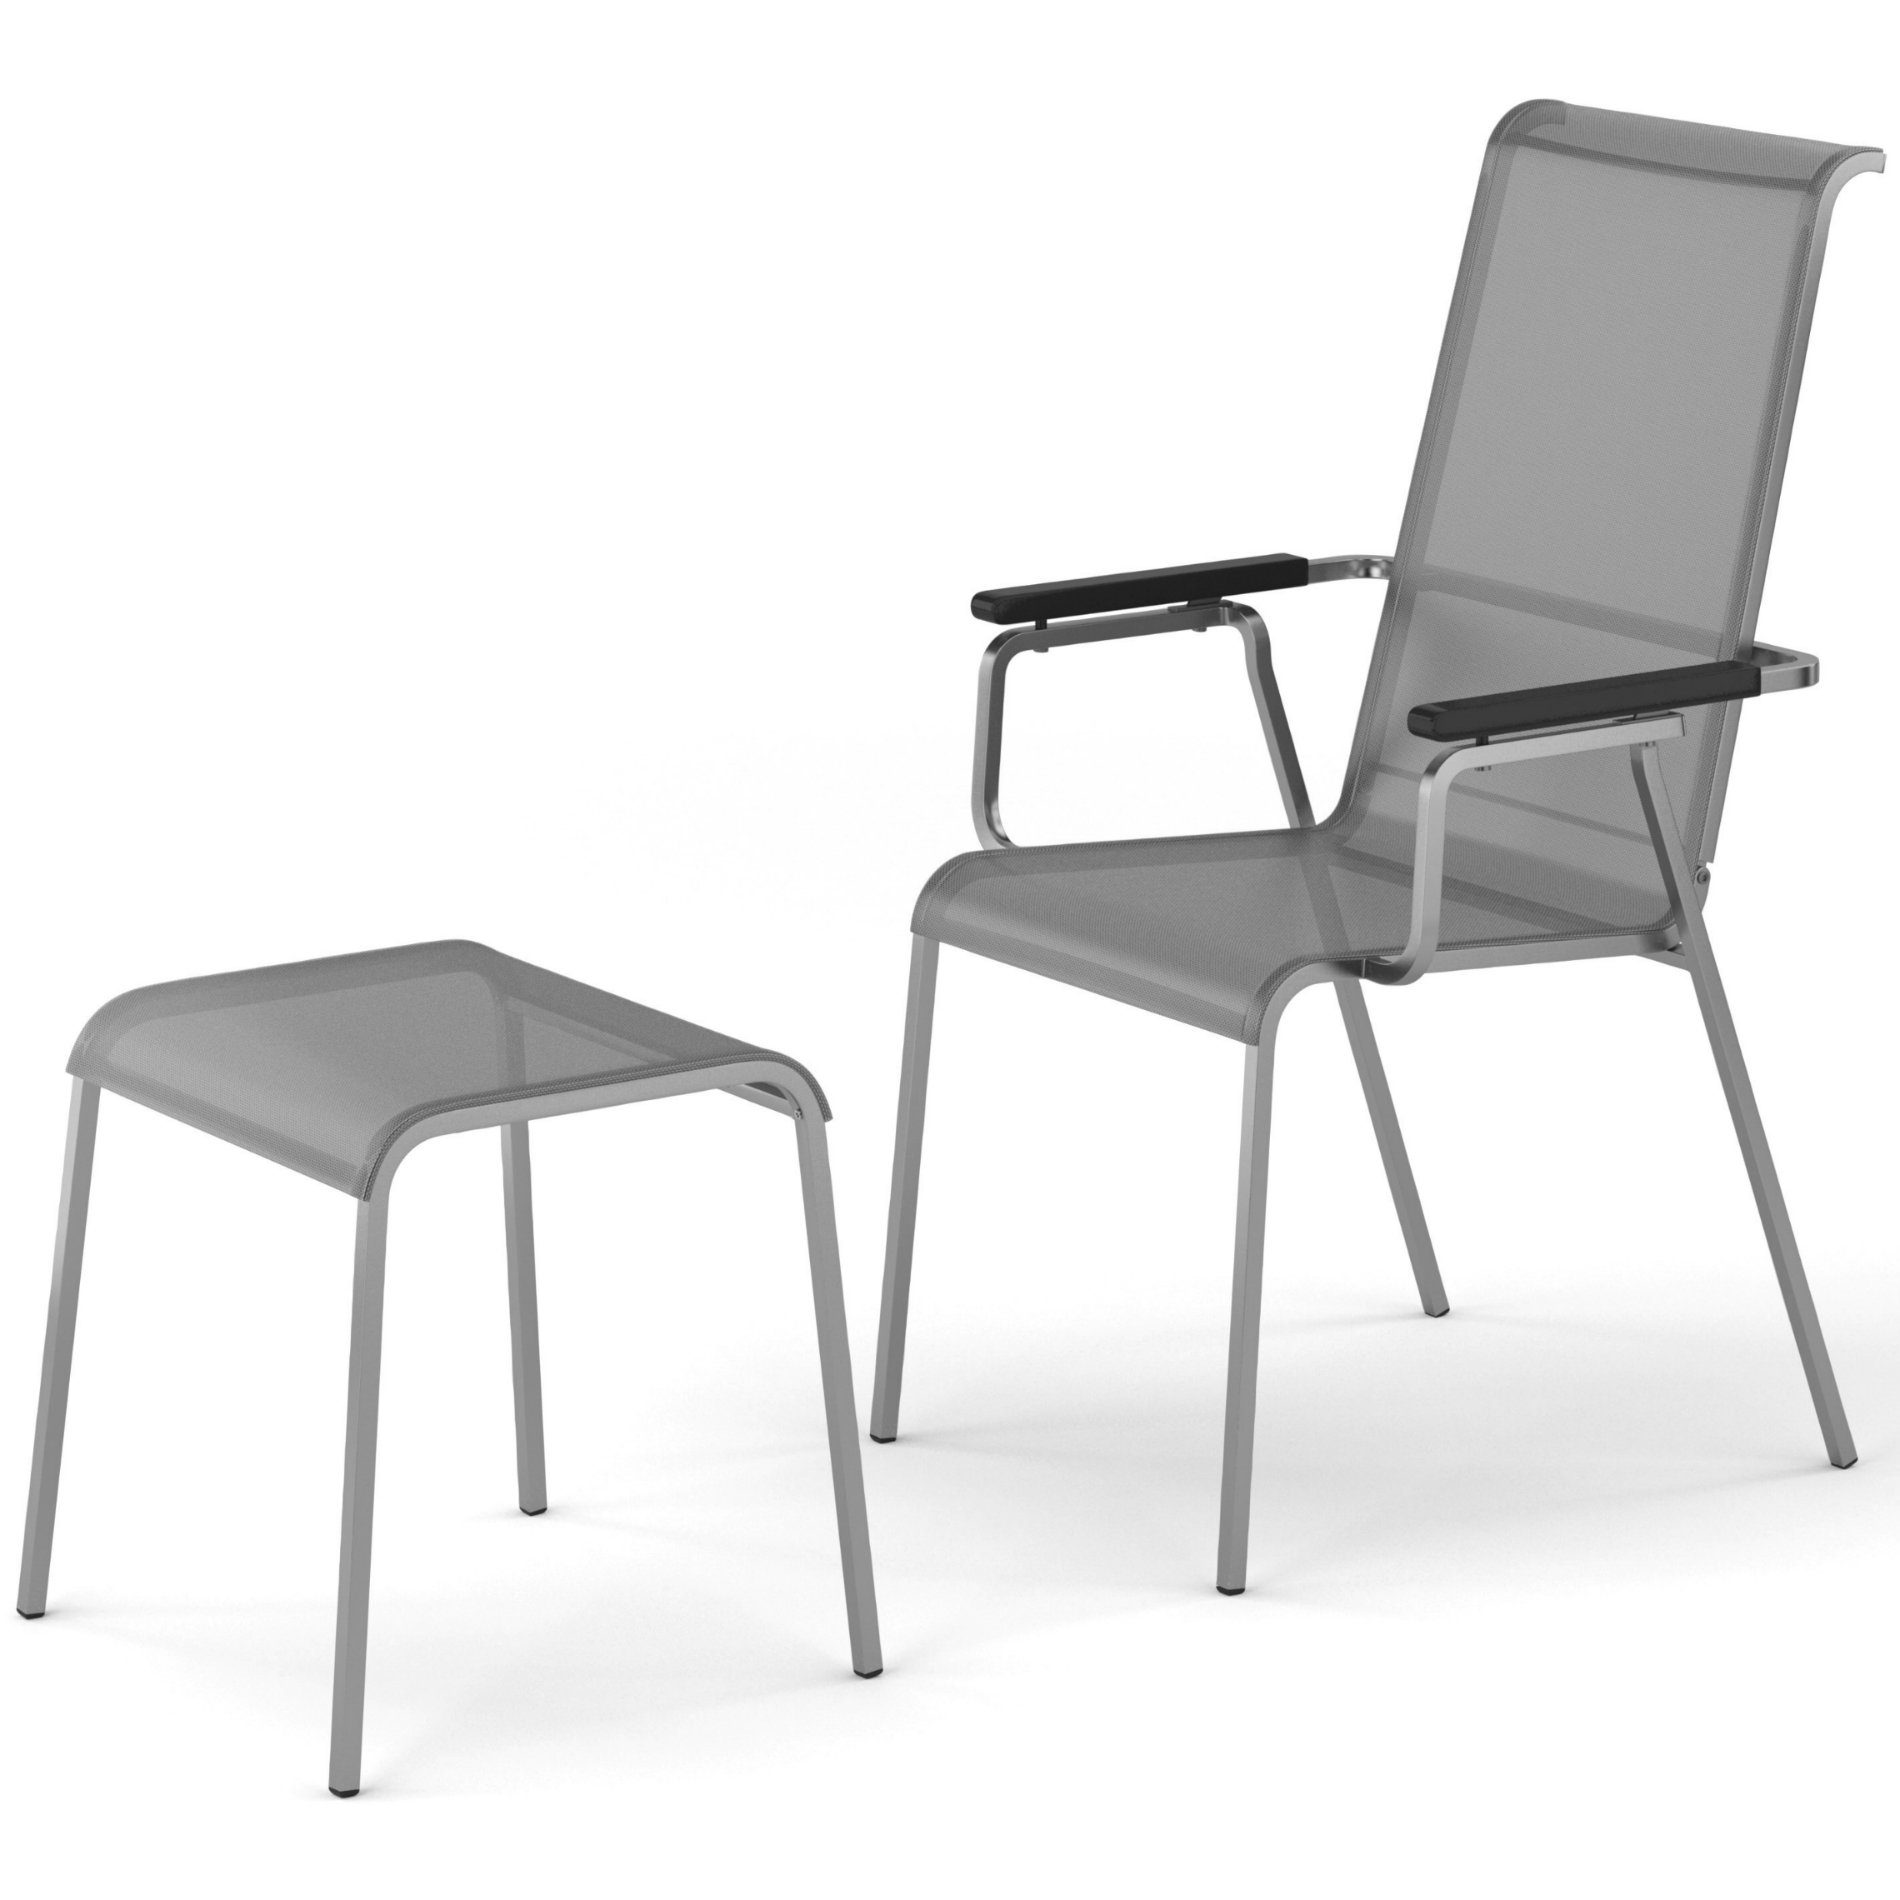 fischer m bel modena gartenhocker. Black Bedroom Furniture Sets. Home Design Ideas